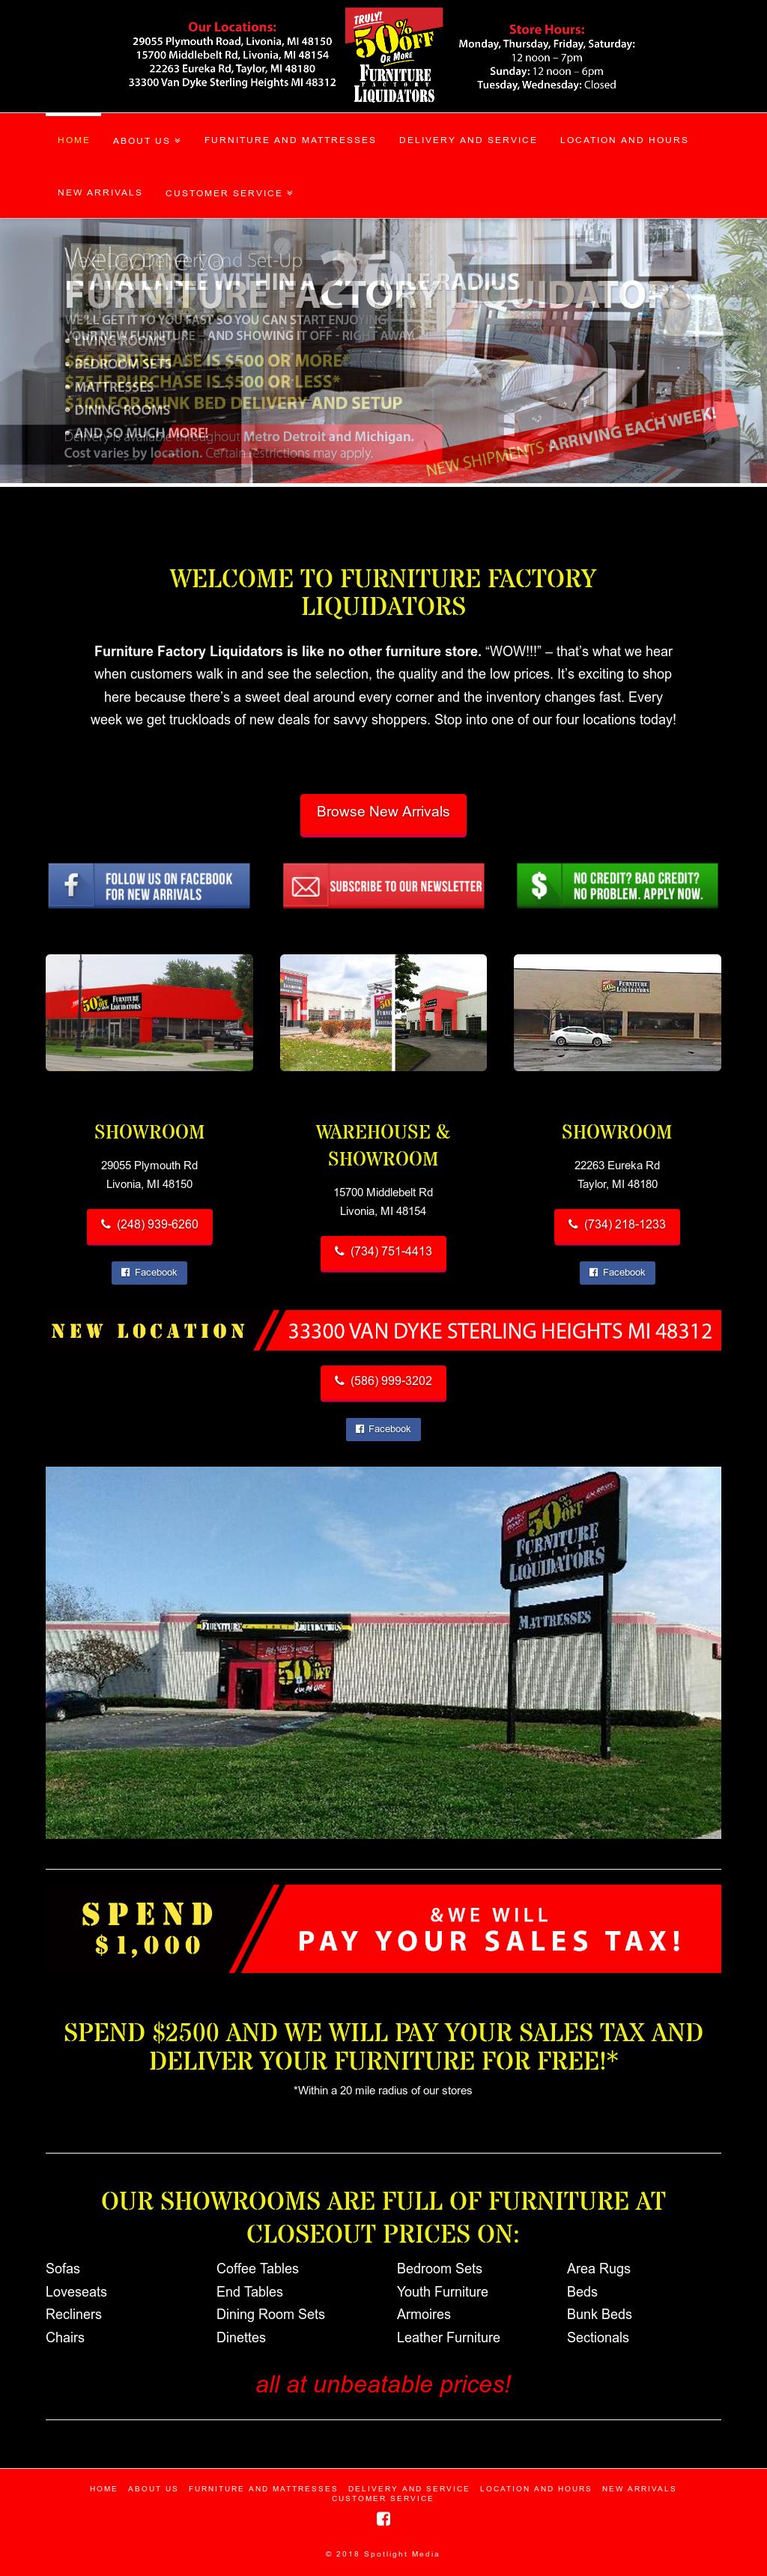 Furniture Factory Liquidators Website History